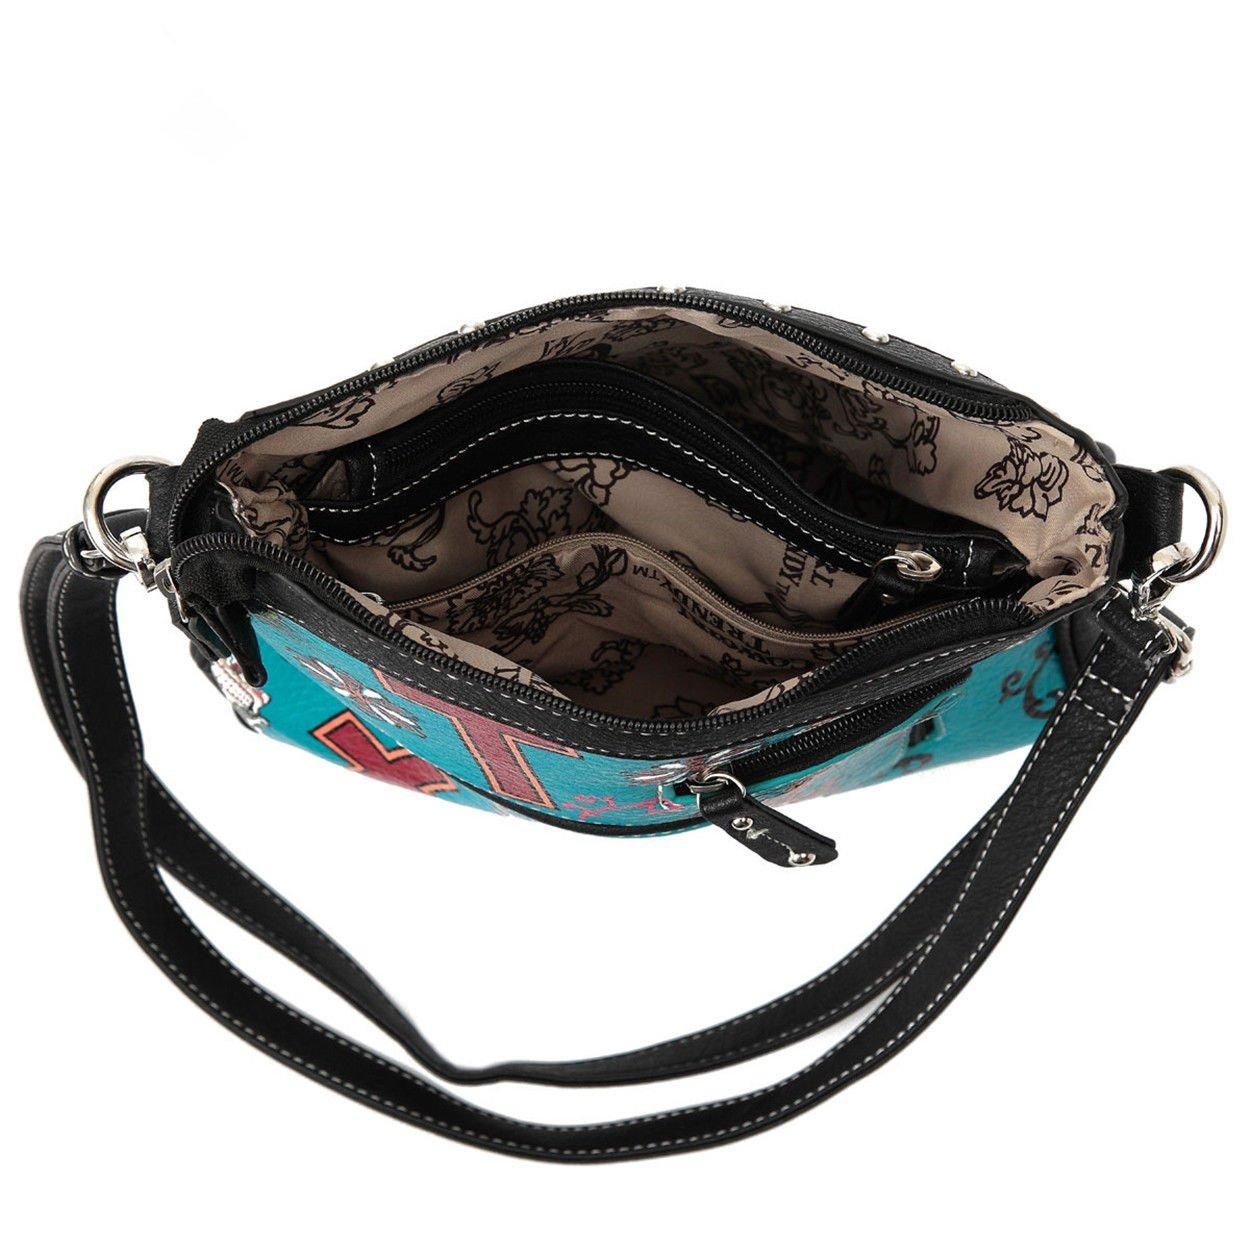 Western Sugar Skull Mini Handbag Girl Crossbody Purse Fashion Single Shoulder Bag Phone Purses (Turquoise) by WESTERN ORIGIN (Image #4)